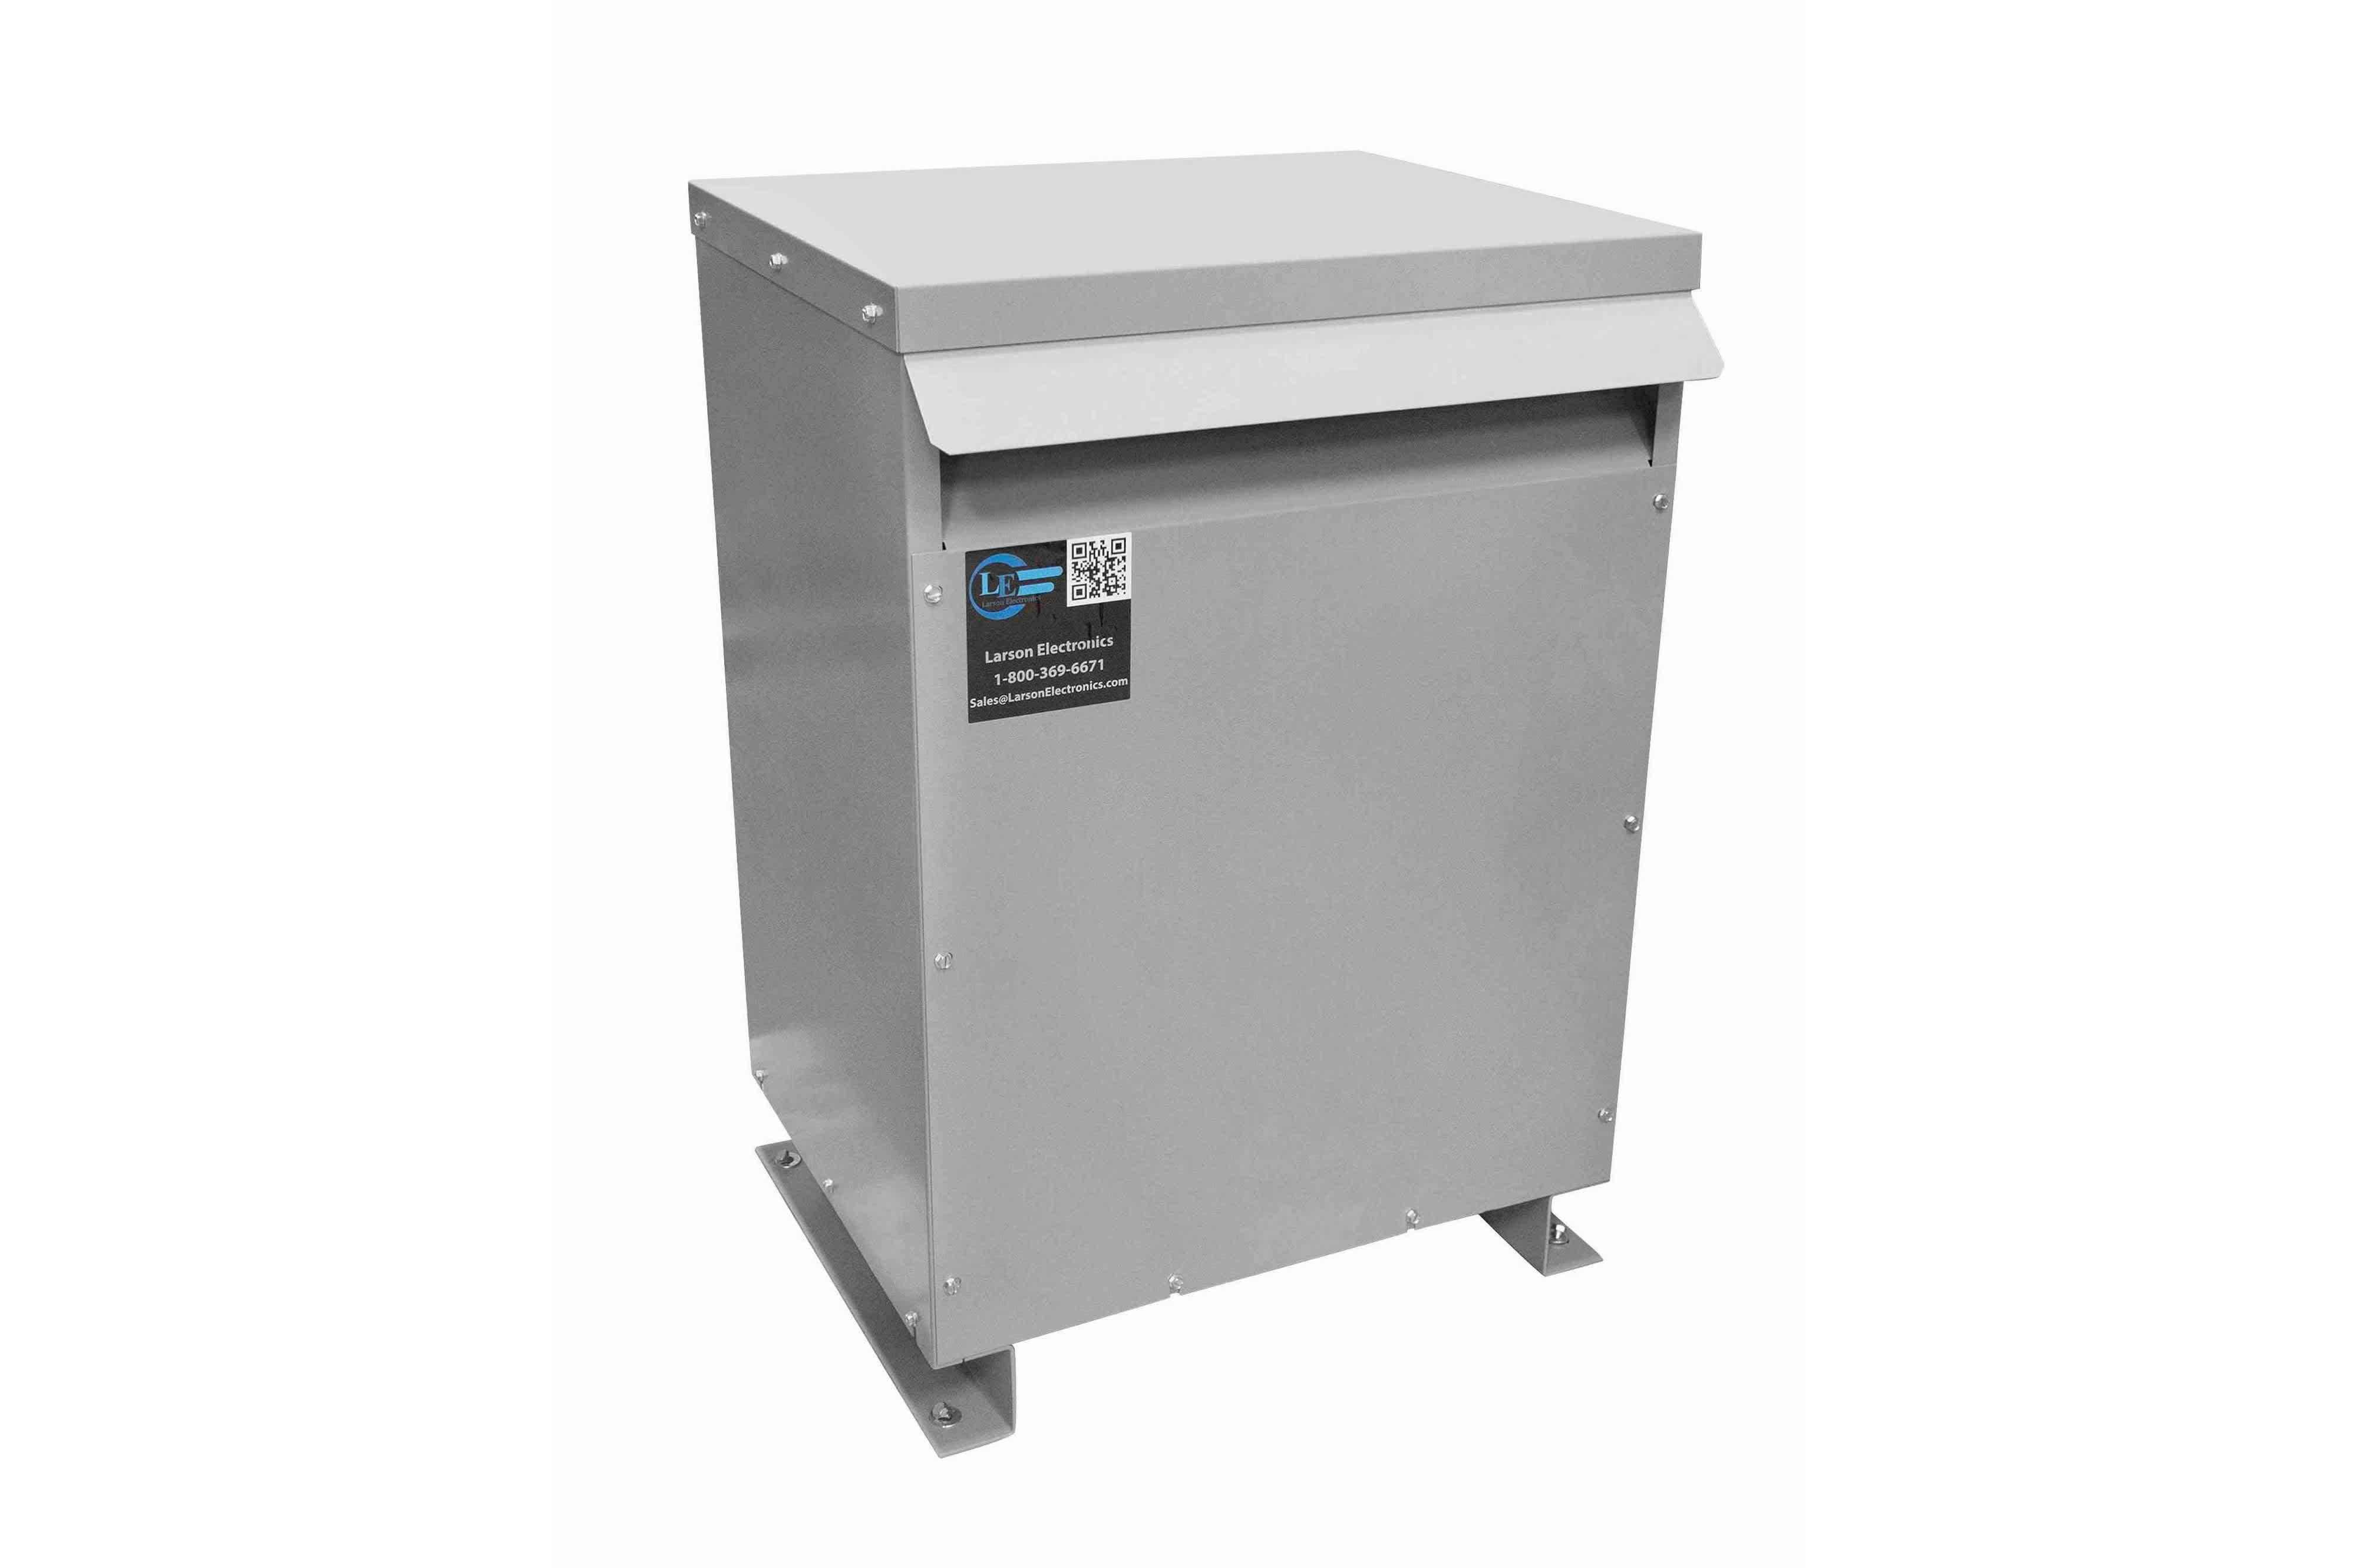 36 kVA 3PH Isolation Transformer, 460V Wye Primary, 208Y/120 Wye-N Secondary, N3R, Ventilated, 60 Hz